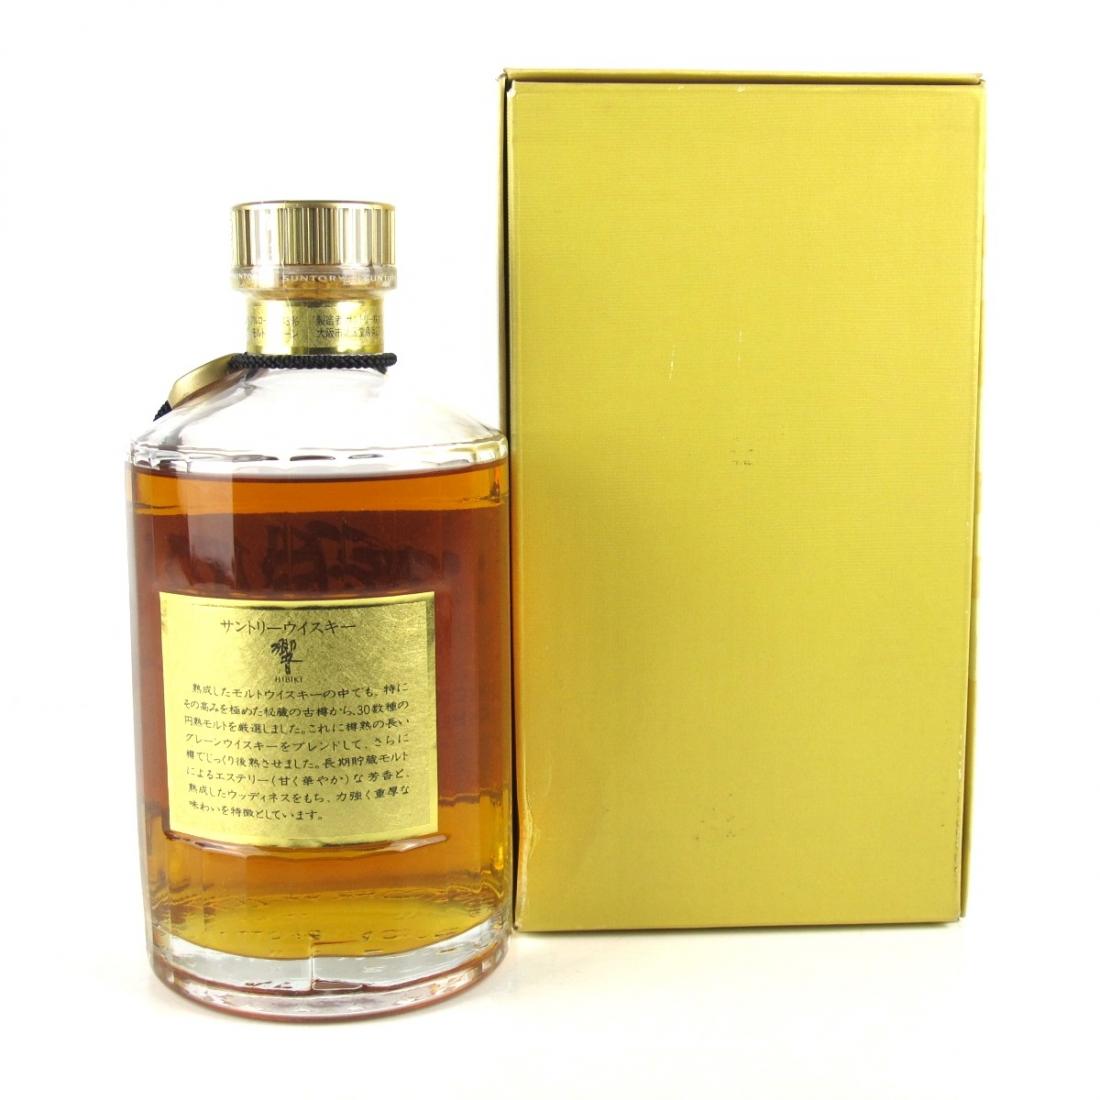 Hibiki / Suntory Whisky 1990s